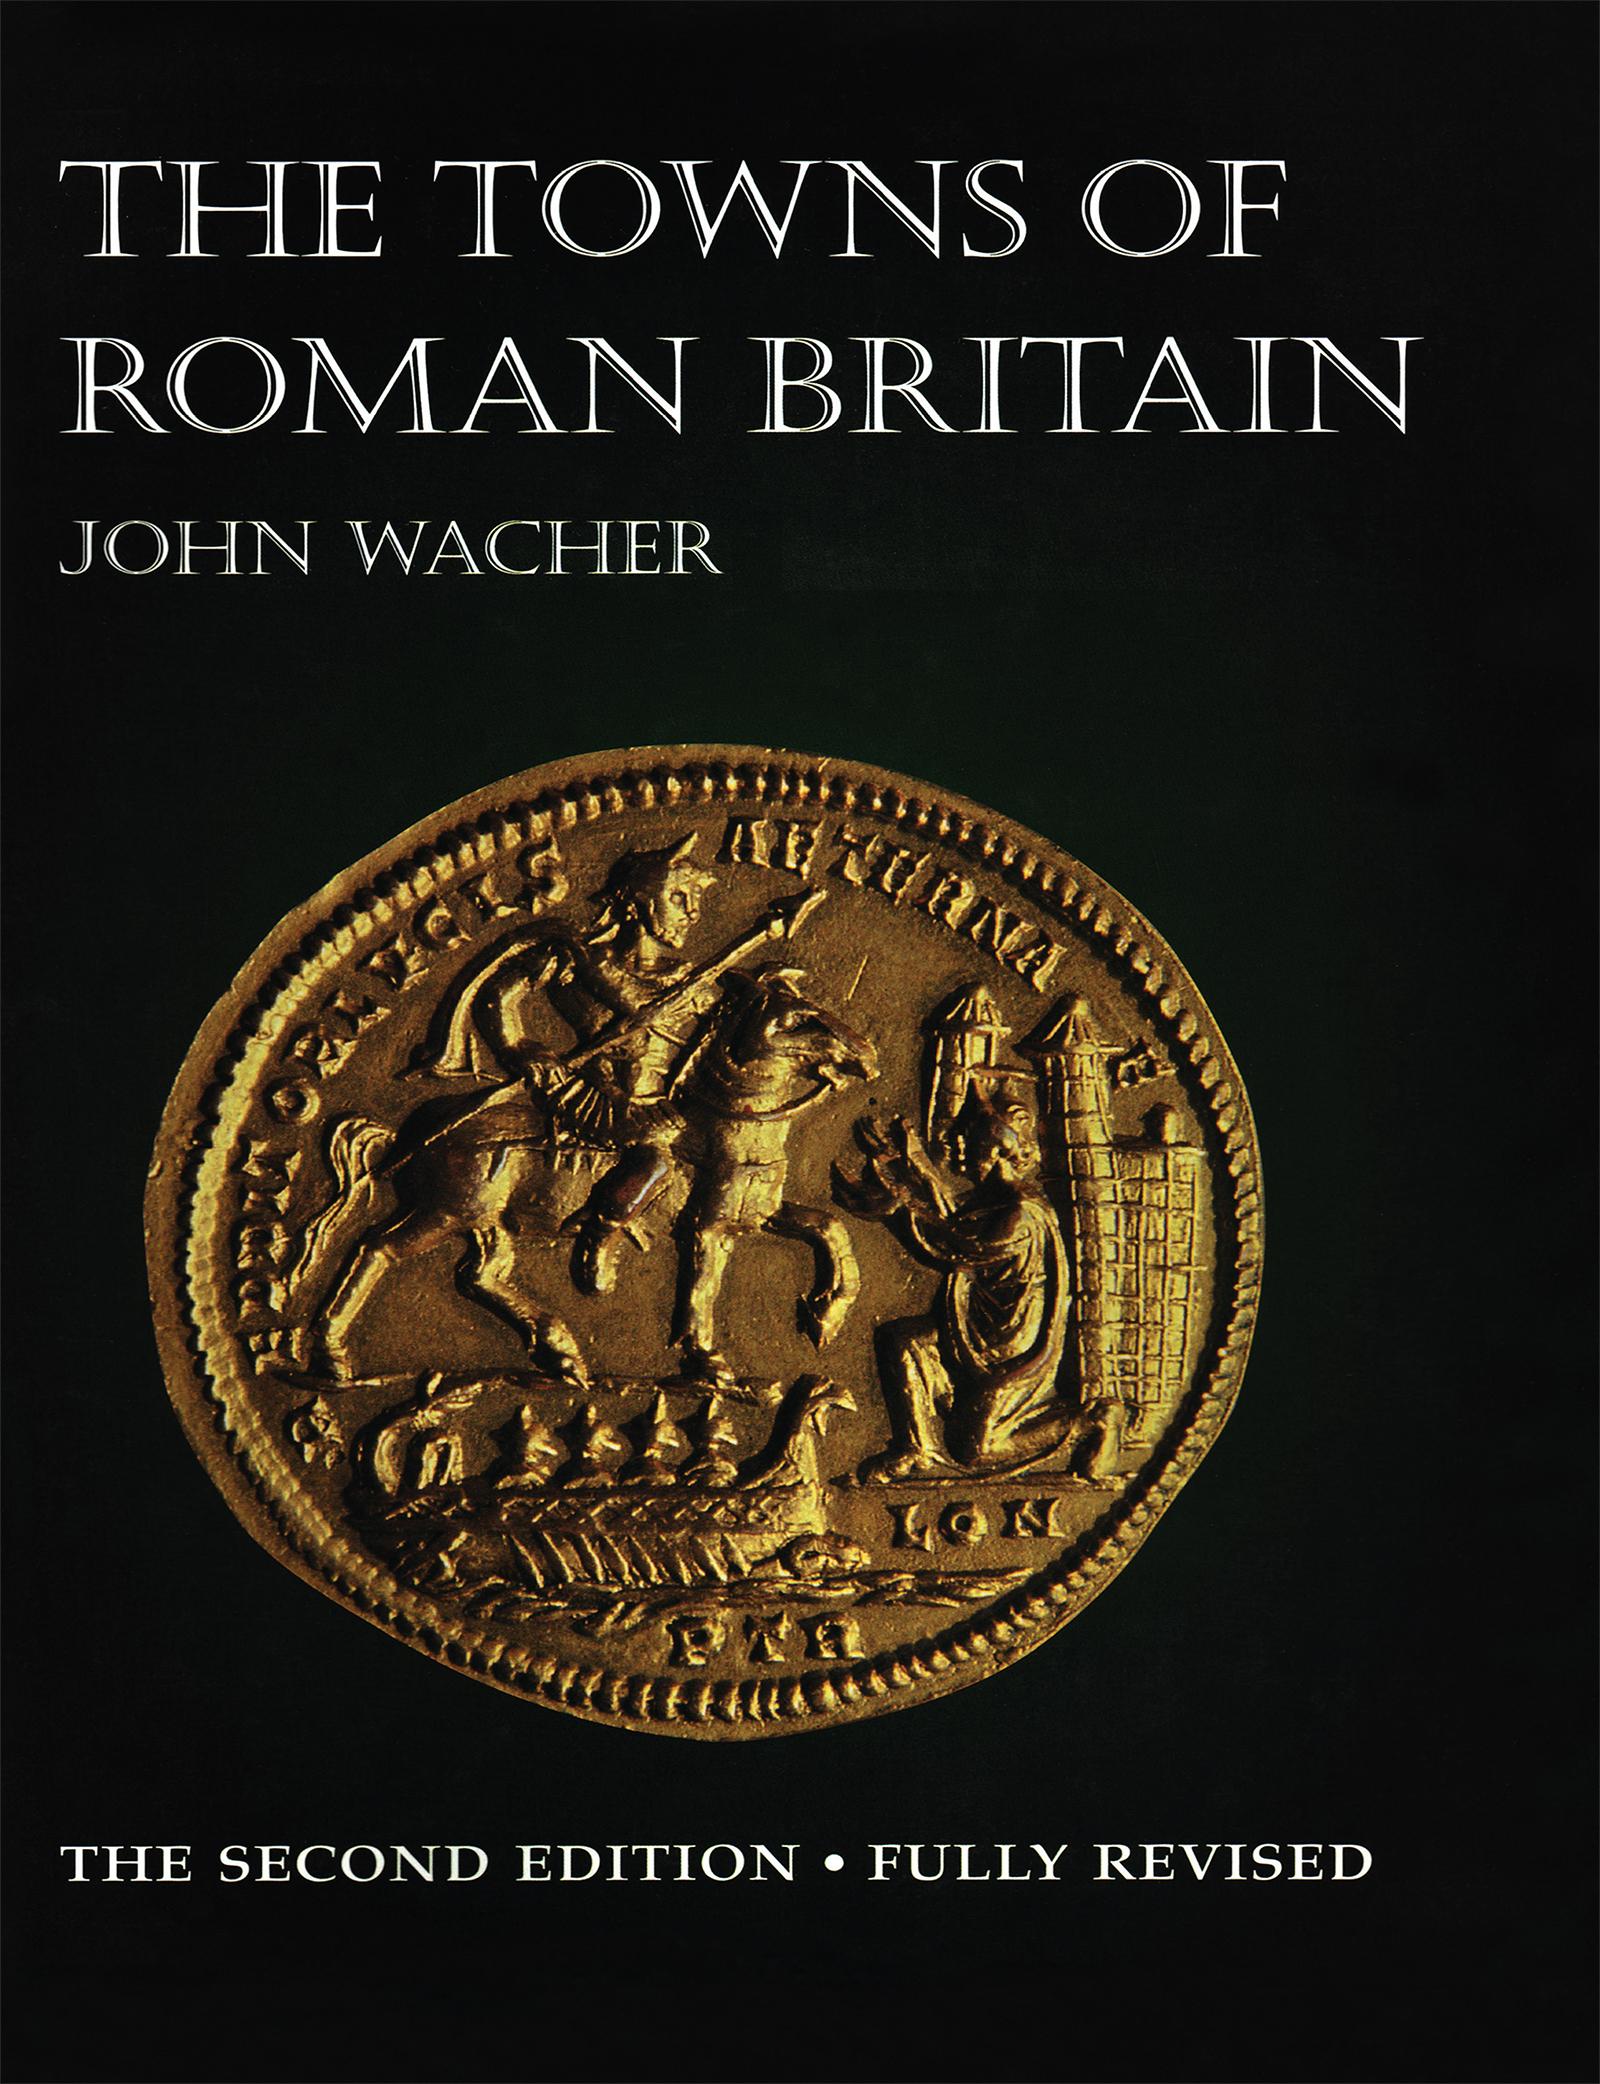 TOWNS OF ROMAN BRITAIN